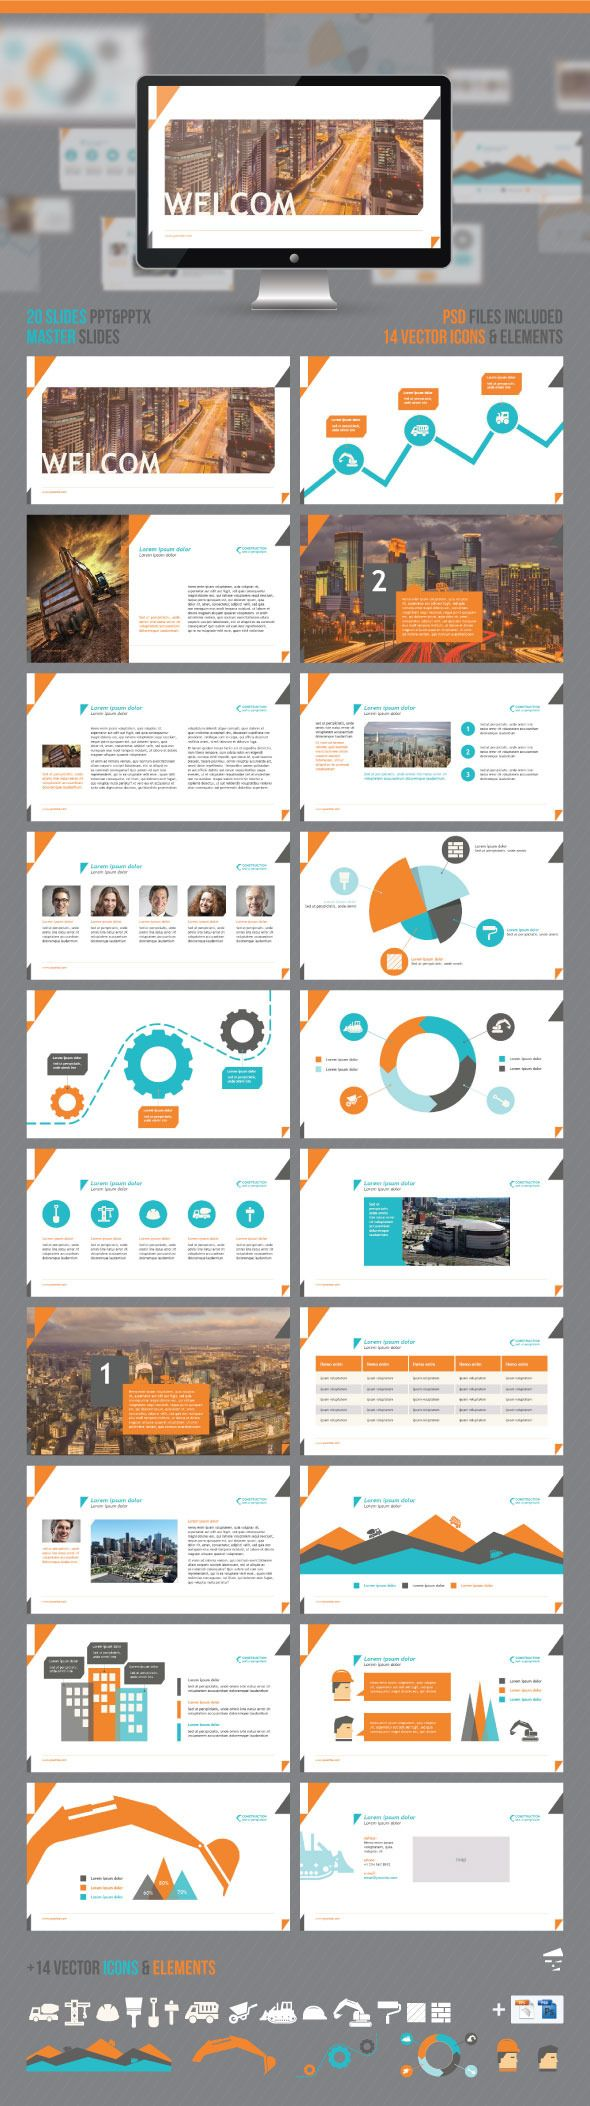 12 best zaa images on pinterest microsoft powerpoint ppt template construction powerpoint presentation toneelgroepblik Gallery